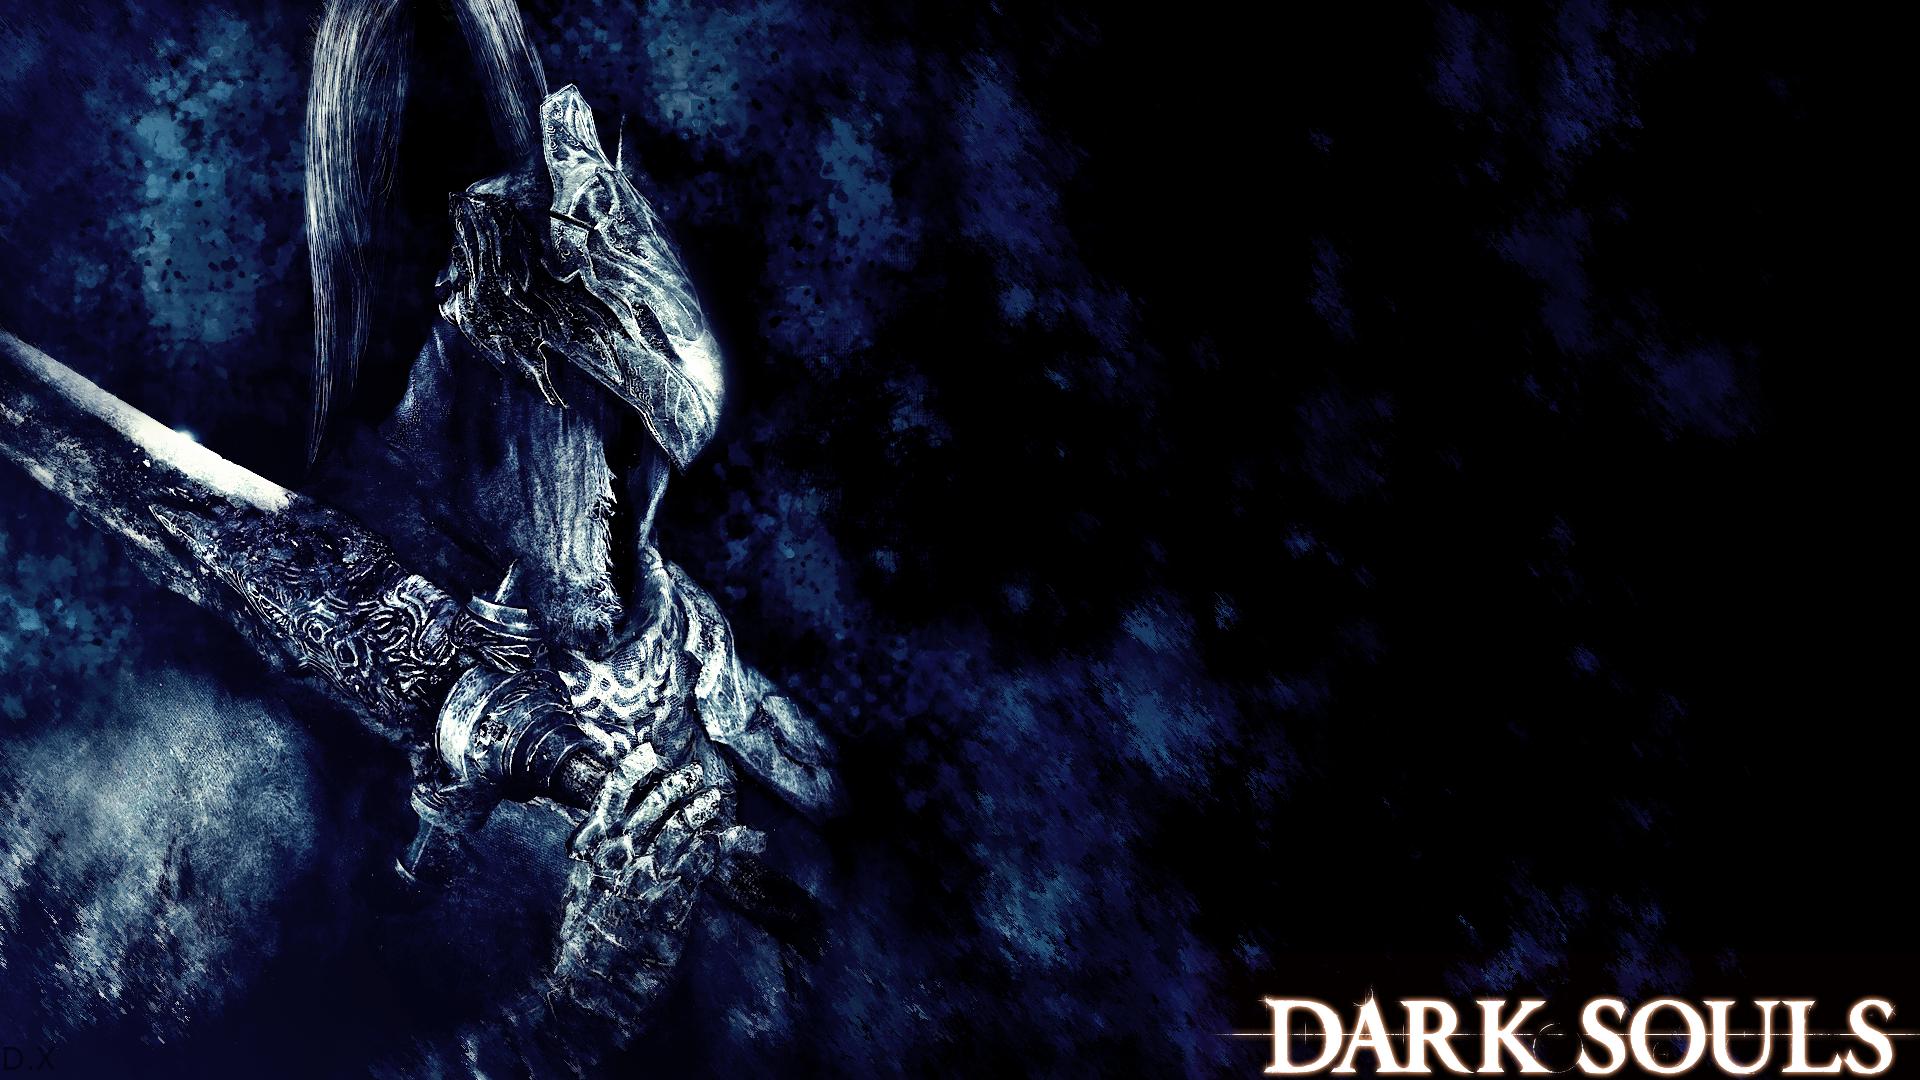 Dark Souls Artorias Hd Wallpaper By Matipatloko On Deviantart